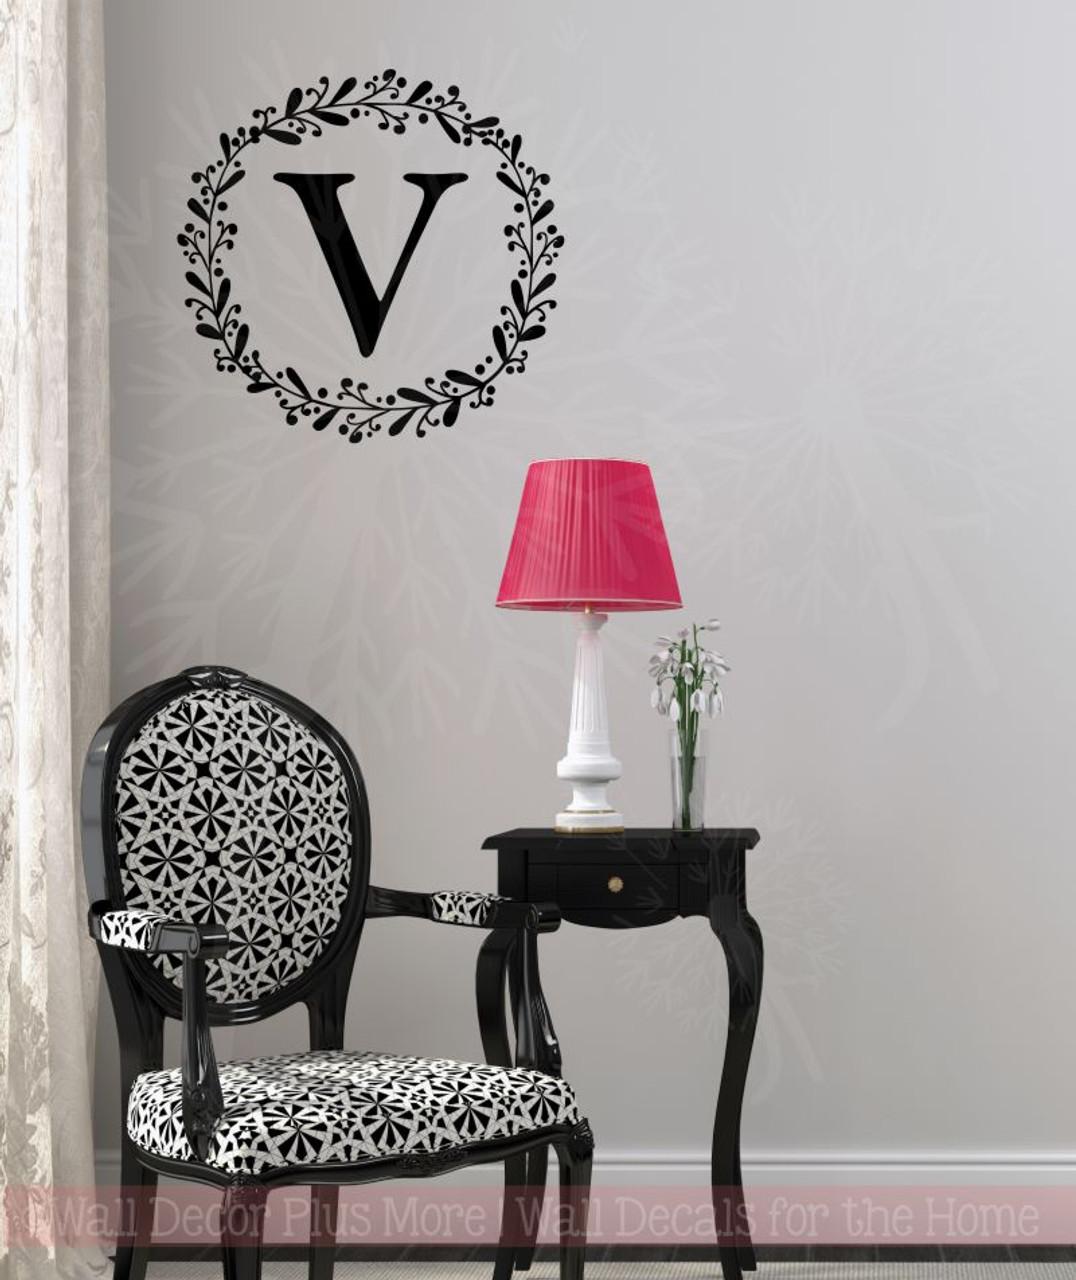 Laurel wreath monogram letter vinyl stickers wall decals custom personalized art